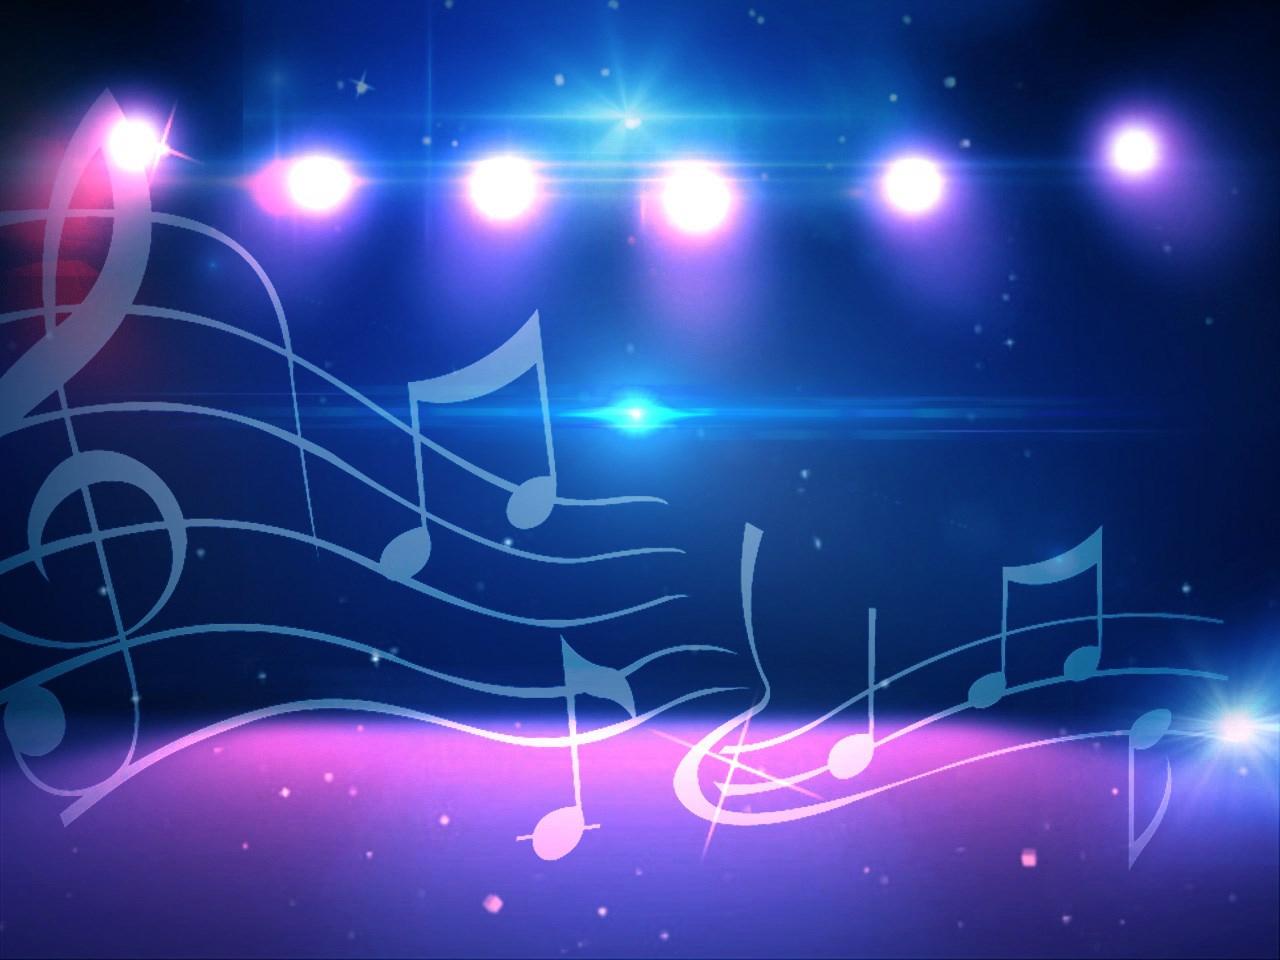 music __1552066347622.jpg.jpg